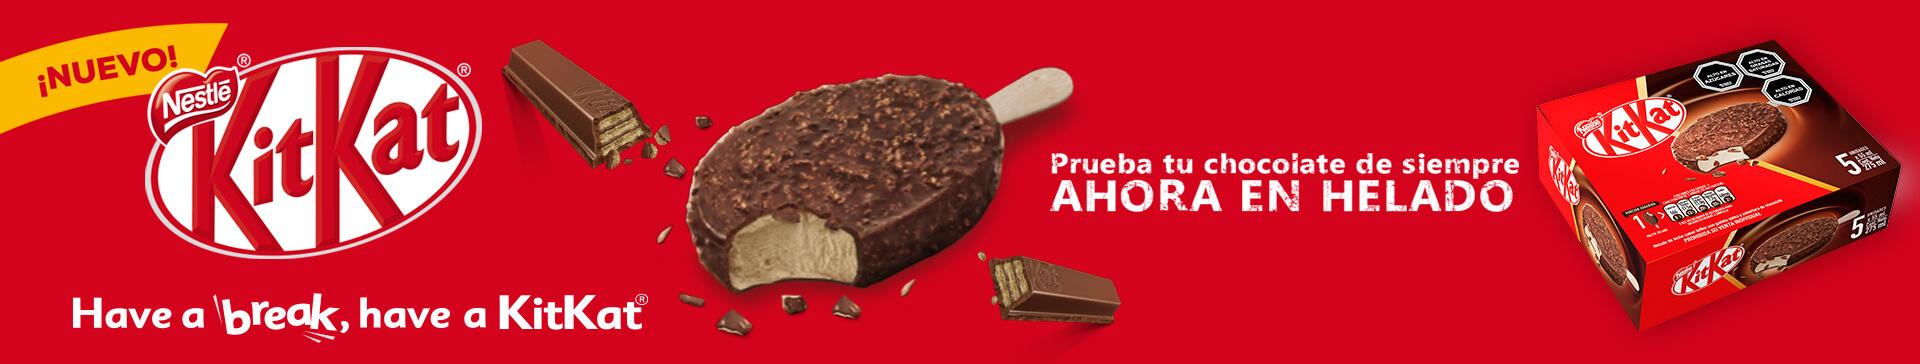 https://www.jumbo.cl/helado-paleta-multipack-5-un-55-ml-c-u/p?nombre_promo=helados-helado-paleta-multipack-25112020